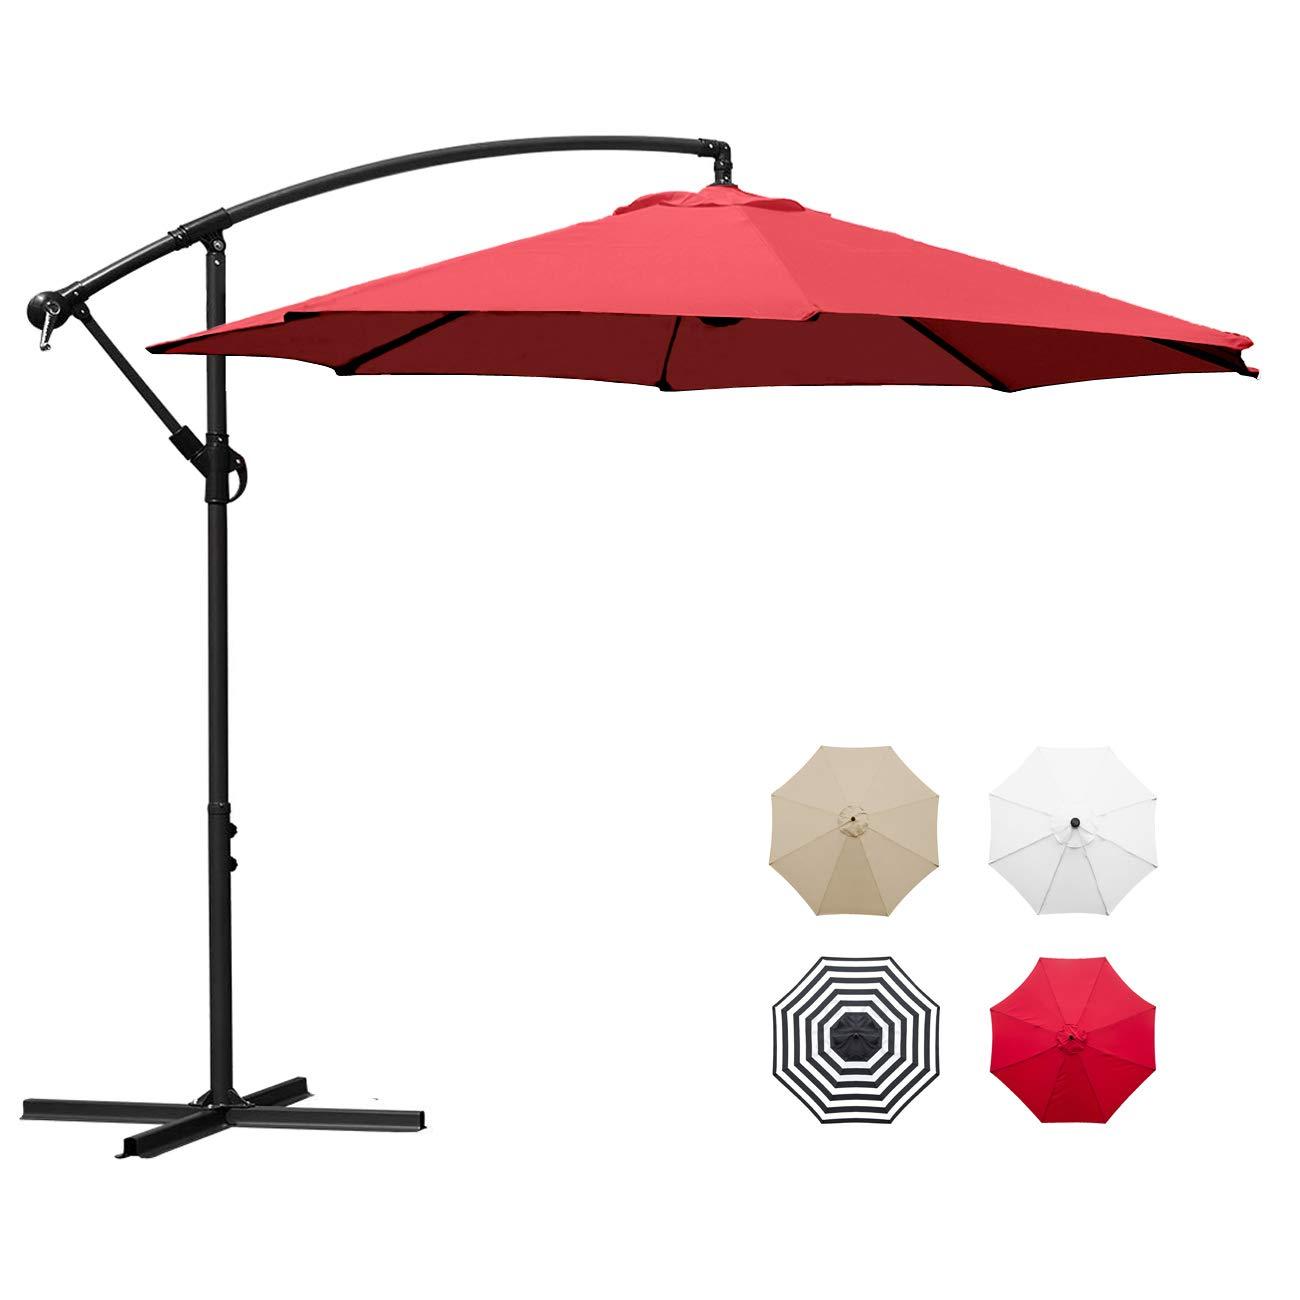 Sunnyglade 10' Outdoor Adjustable Offset Cantilever Hanging Patio Umbrella (Red)